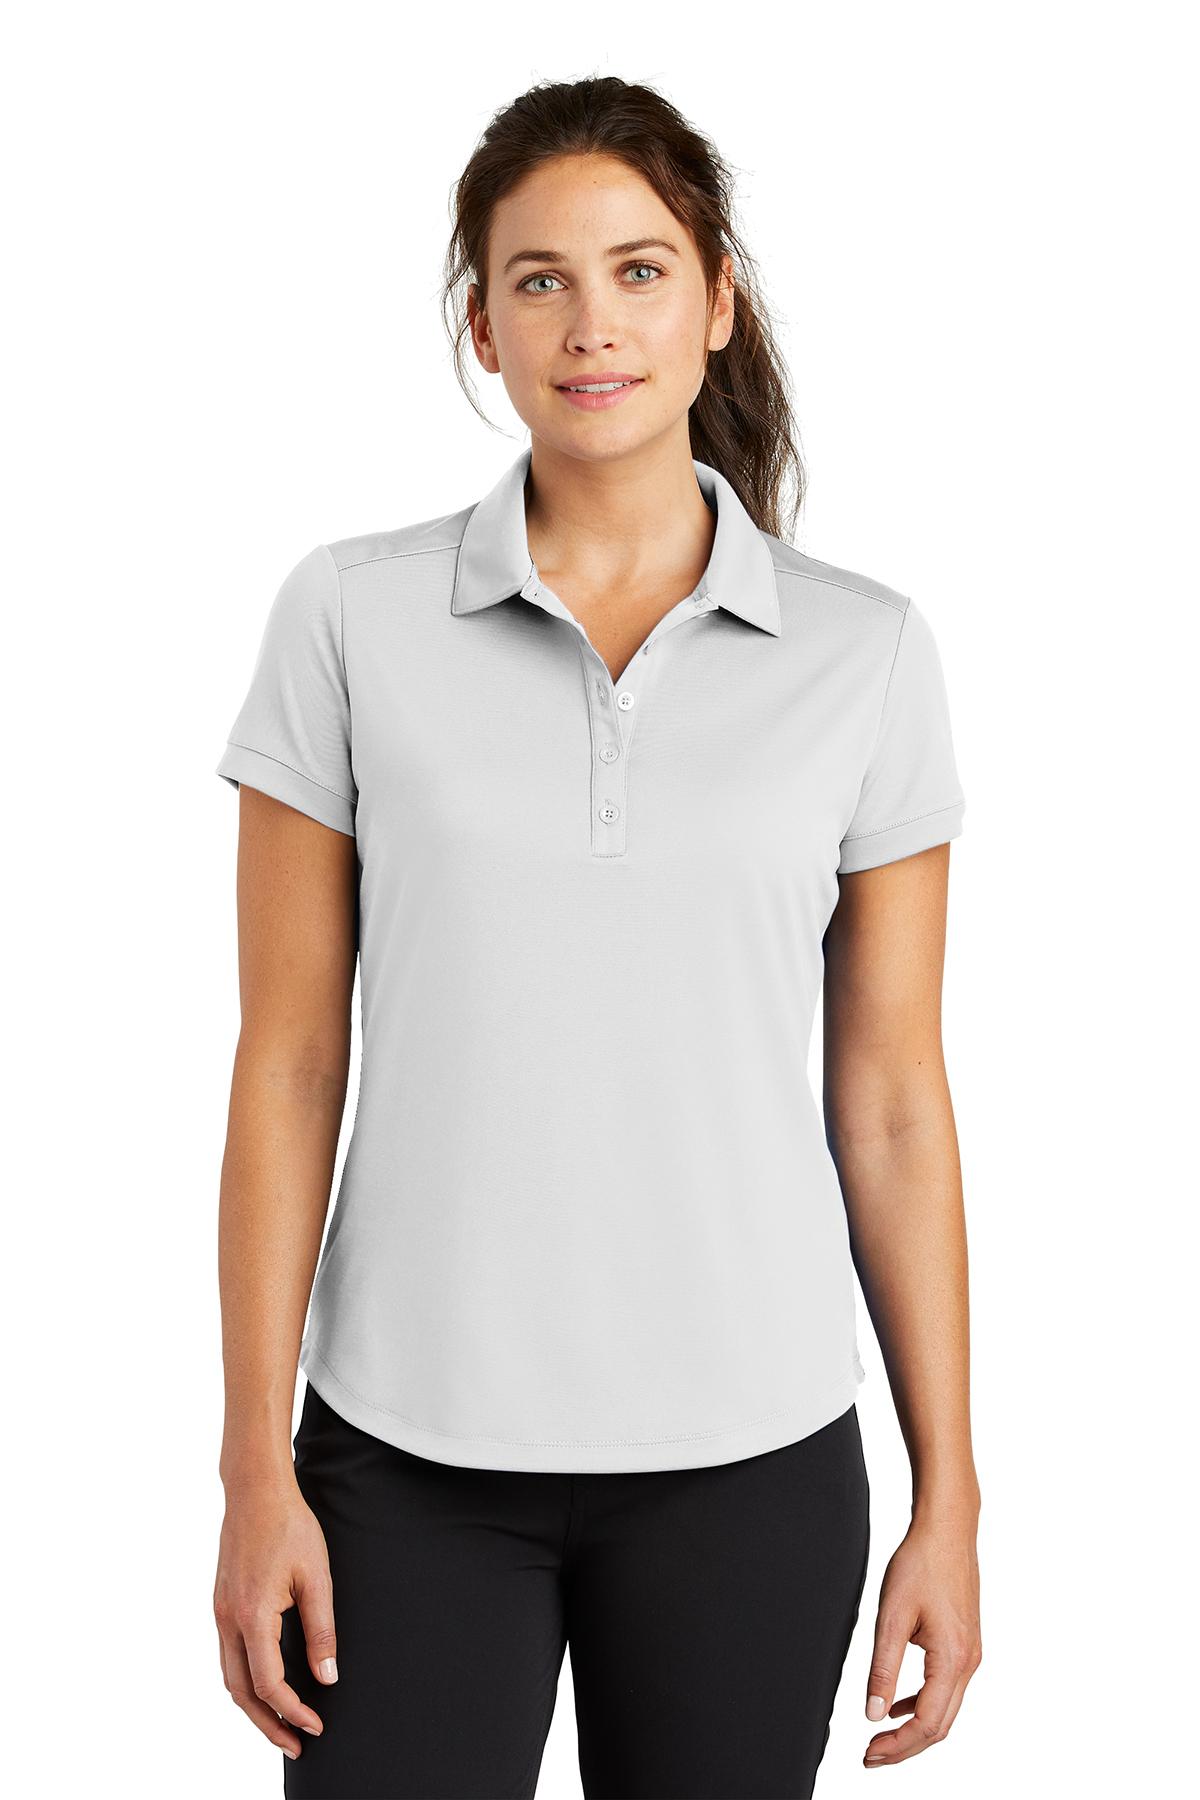 5dfa4016 Nike Ladies Dri-FIT Players Modern Fit Polo | Ladies/Women | Polos ...